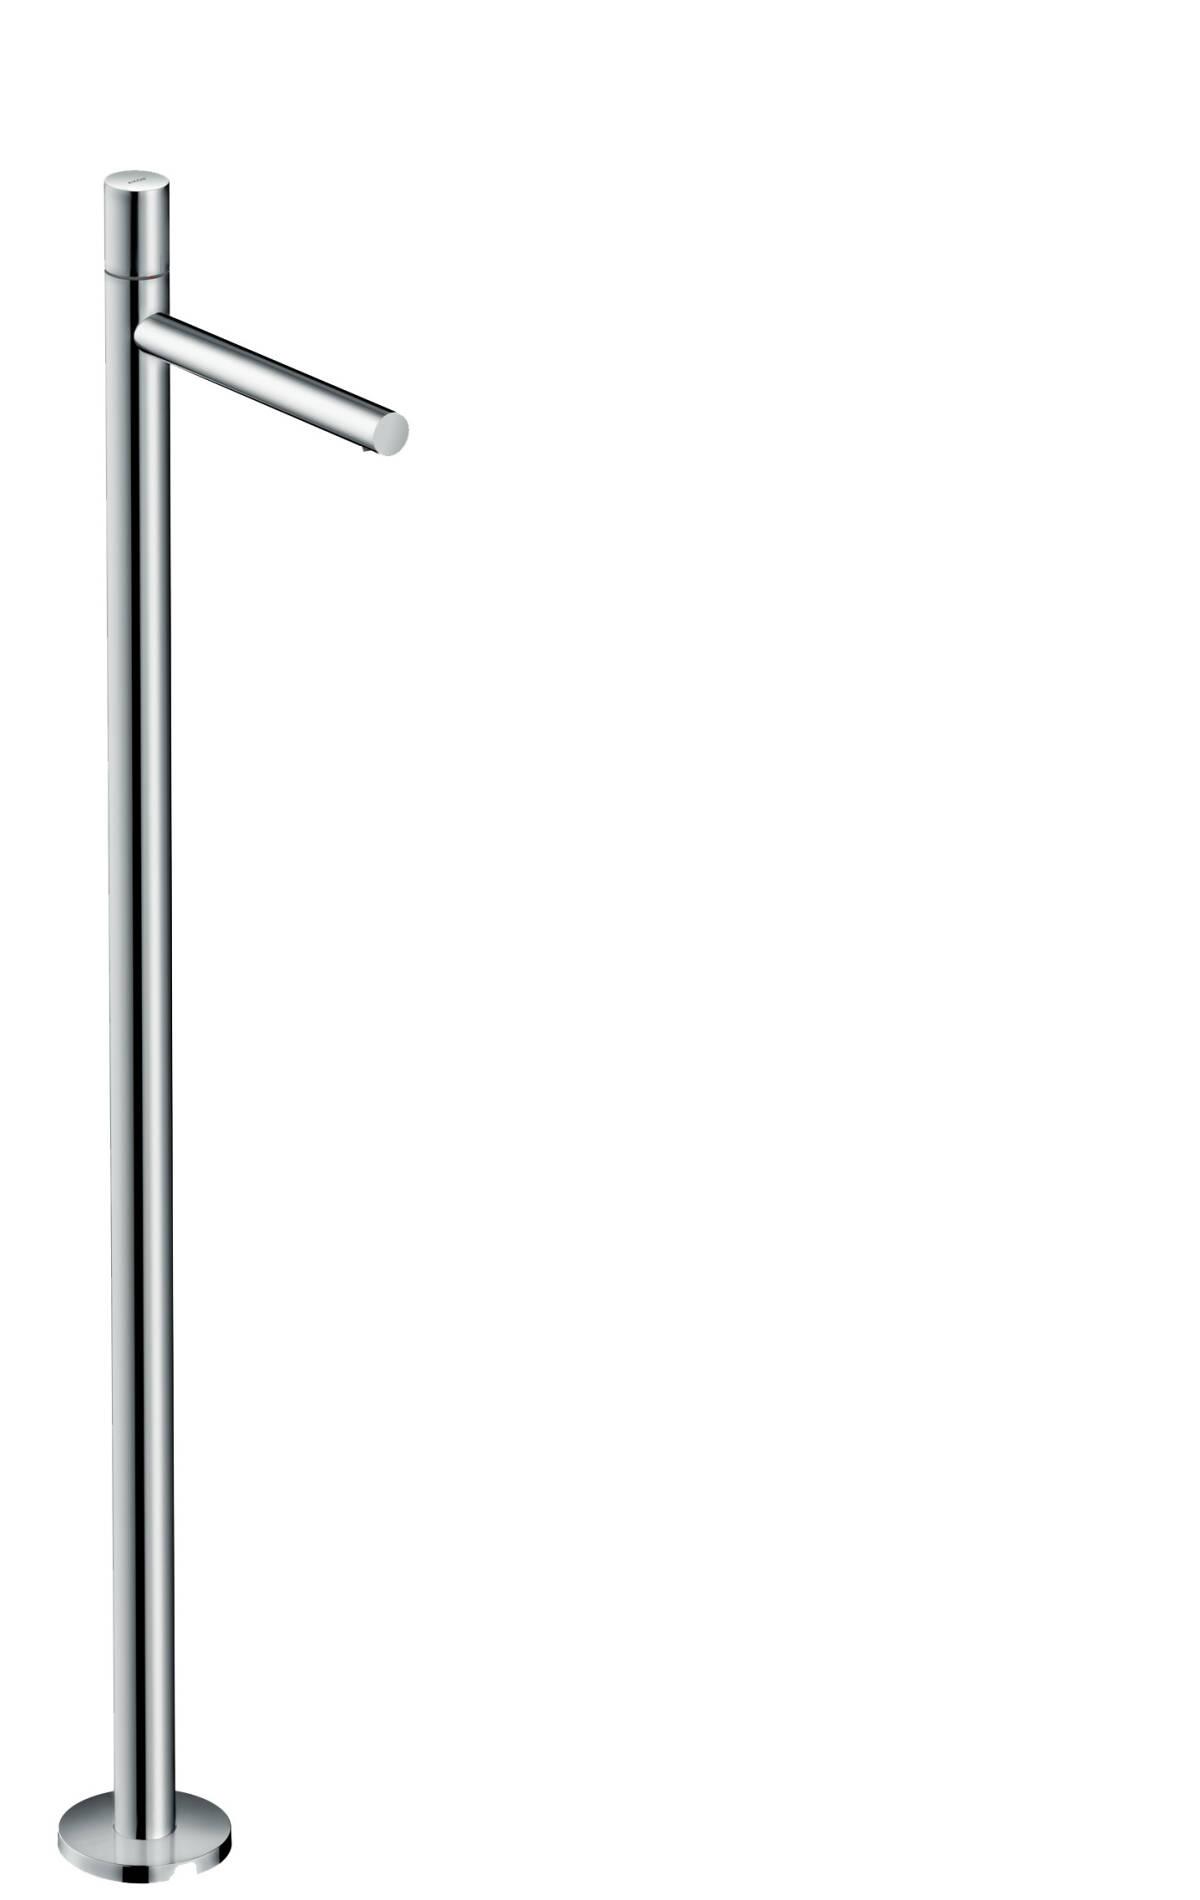 Single lever basin mixer floor-standing zero handle without waste set, Brushed Gold Optic, 45037250